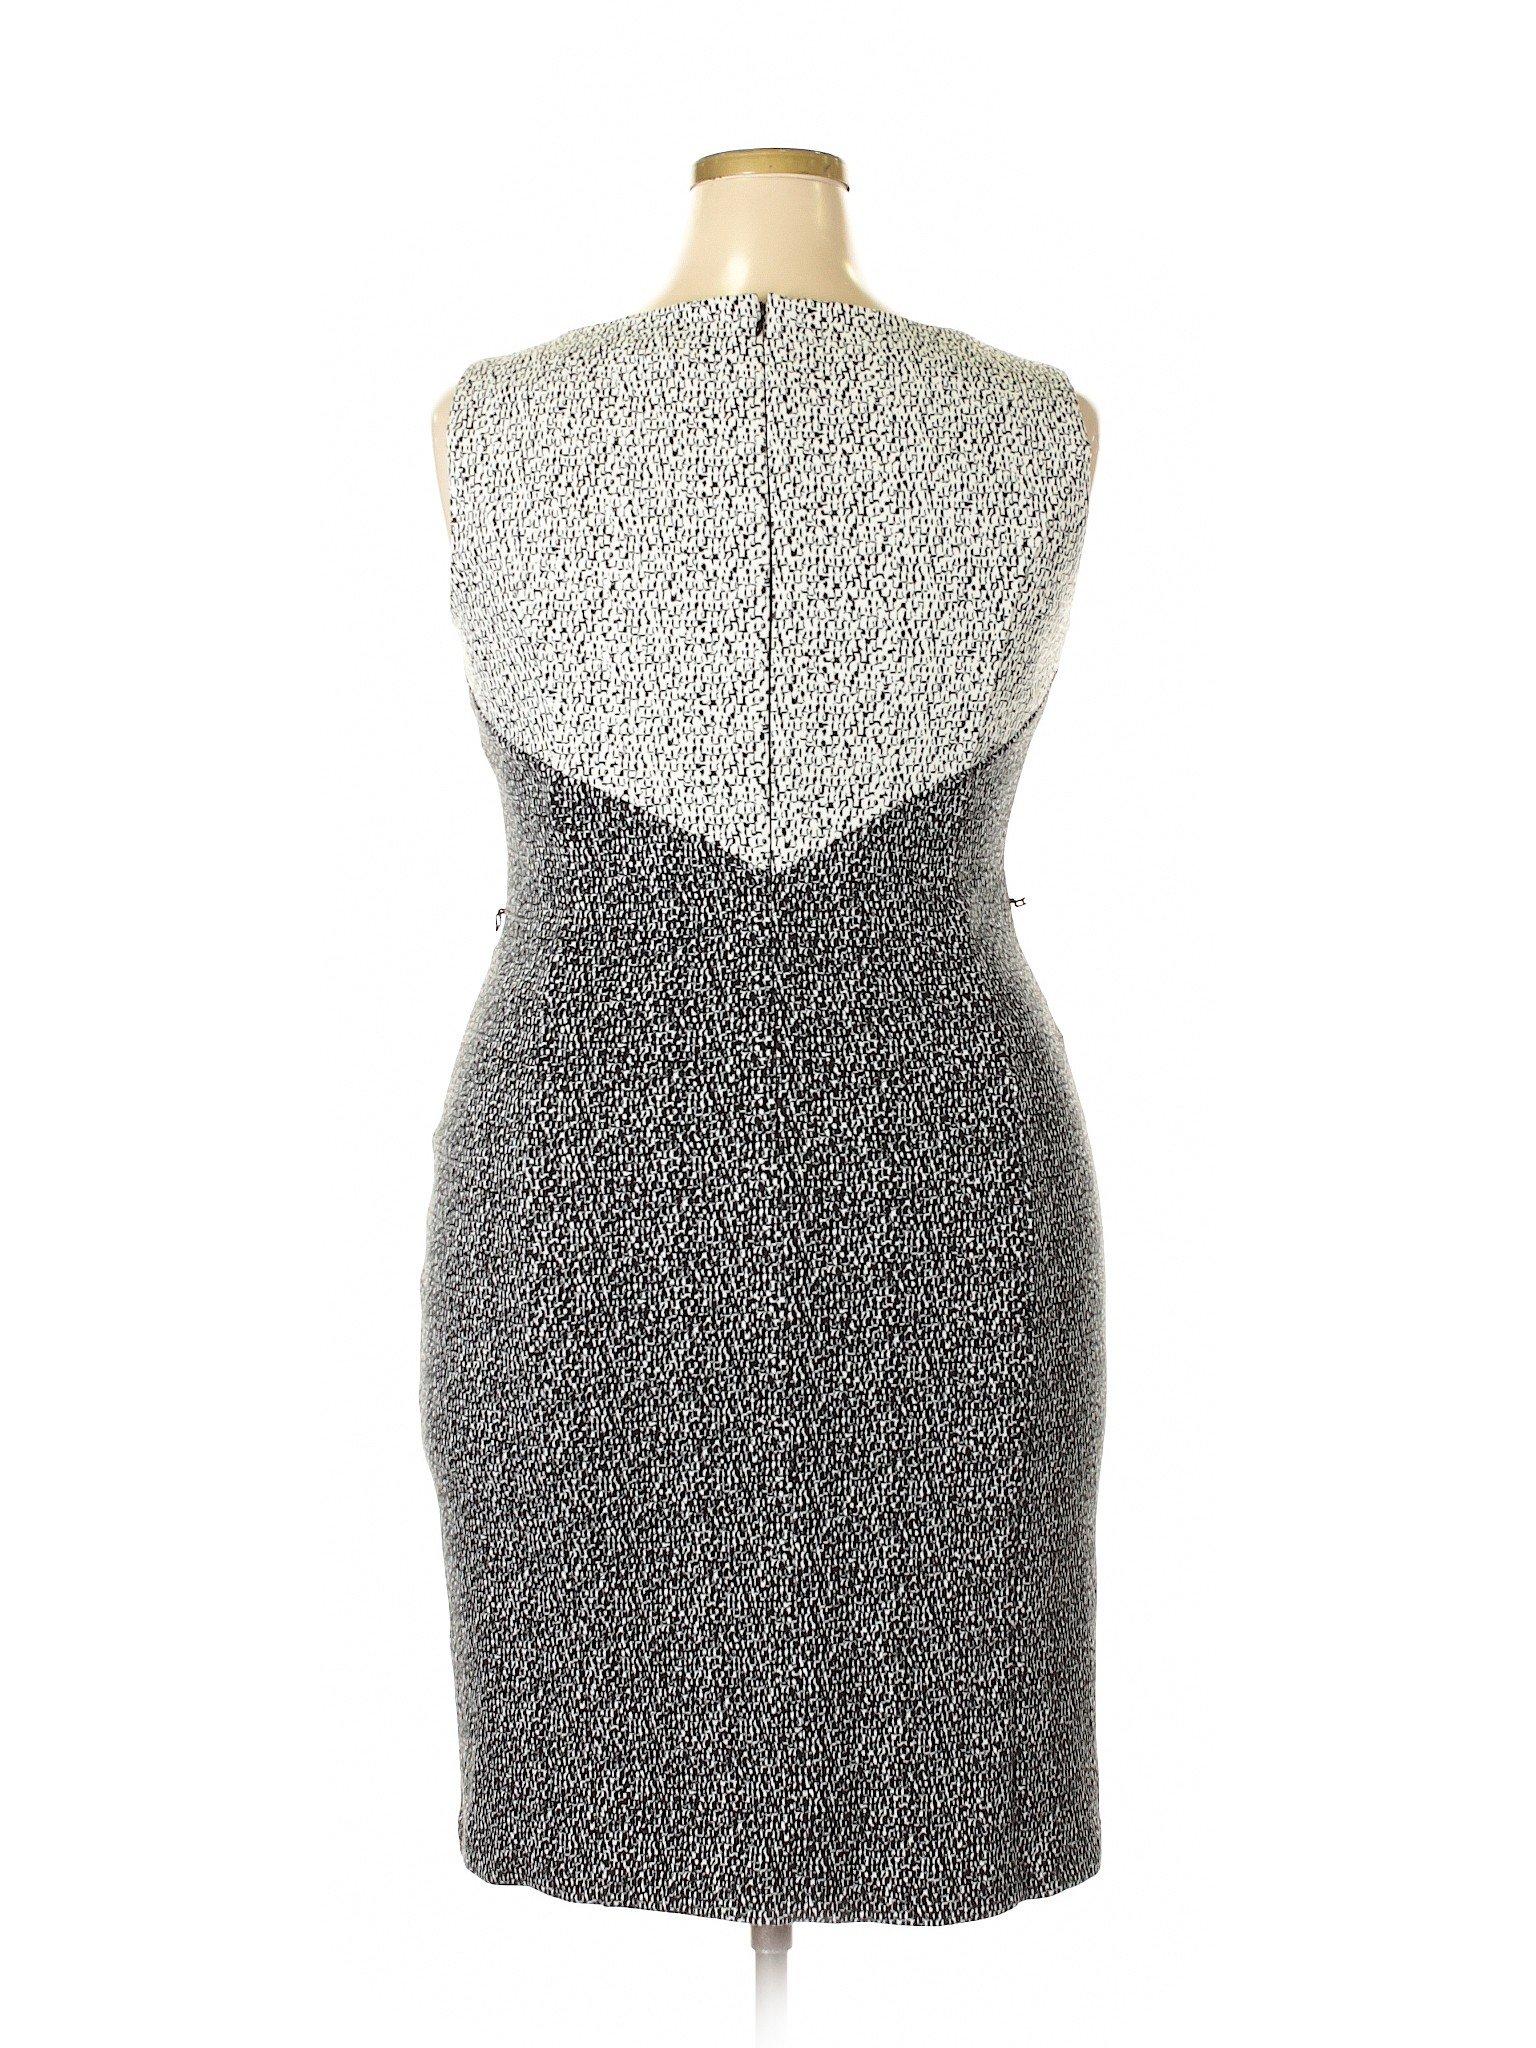 White Casual Dress Selling Black House Market Rxdnzv4q